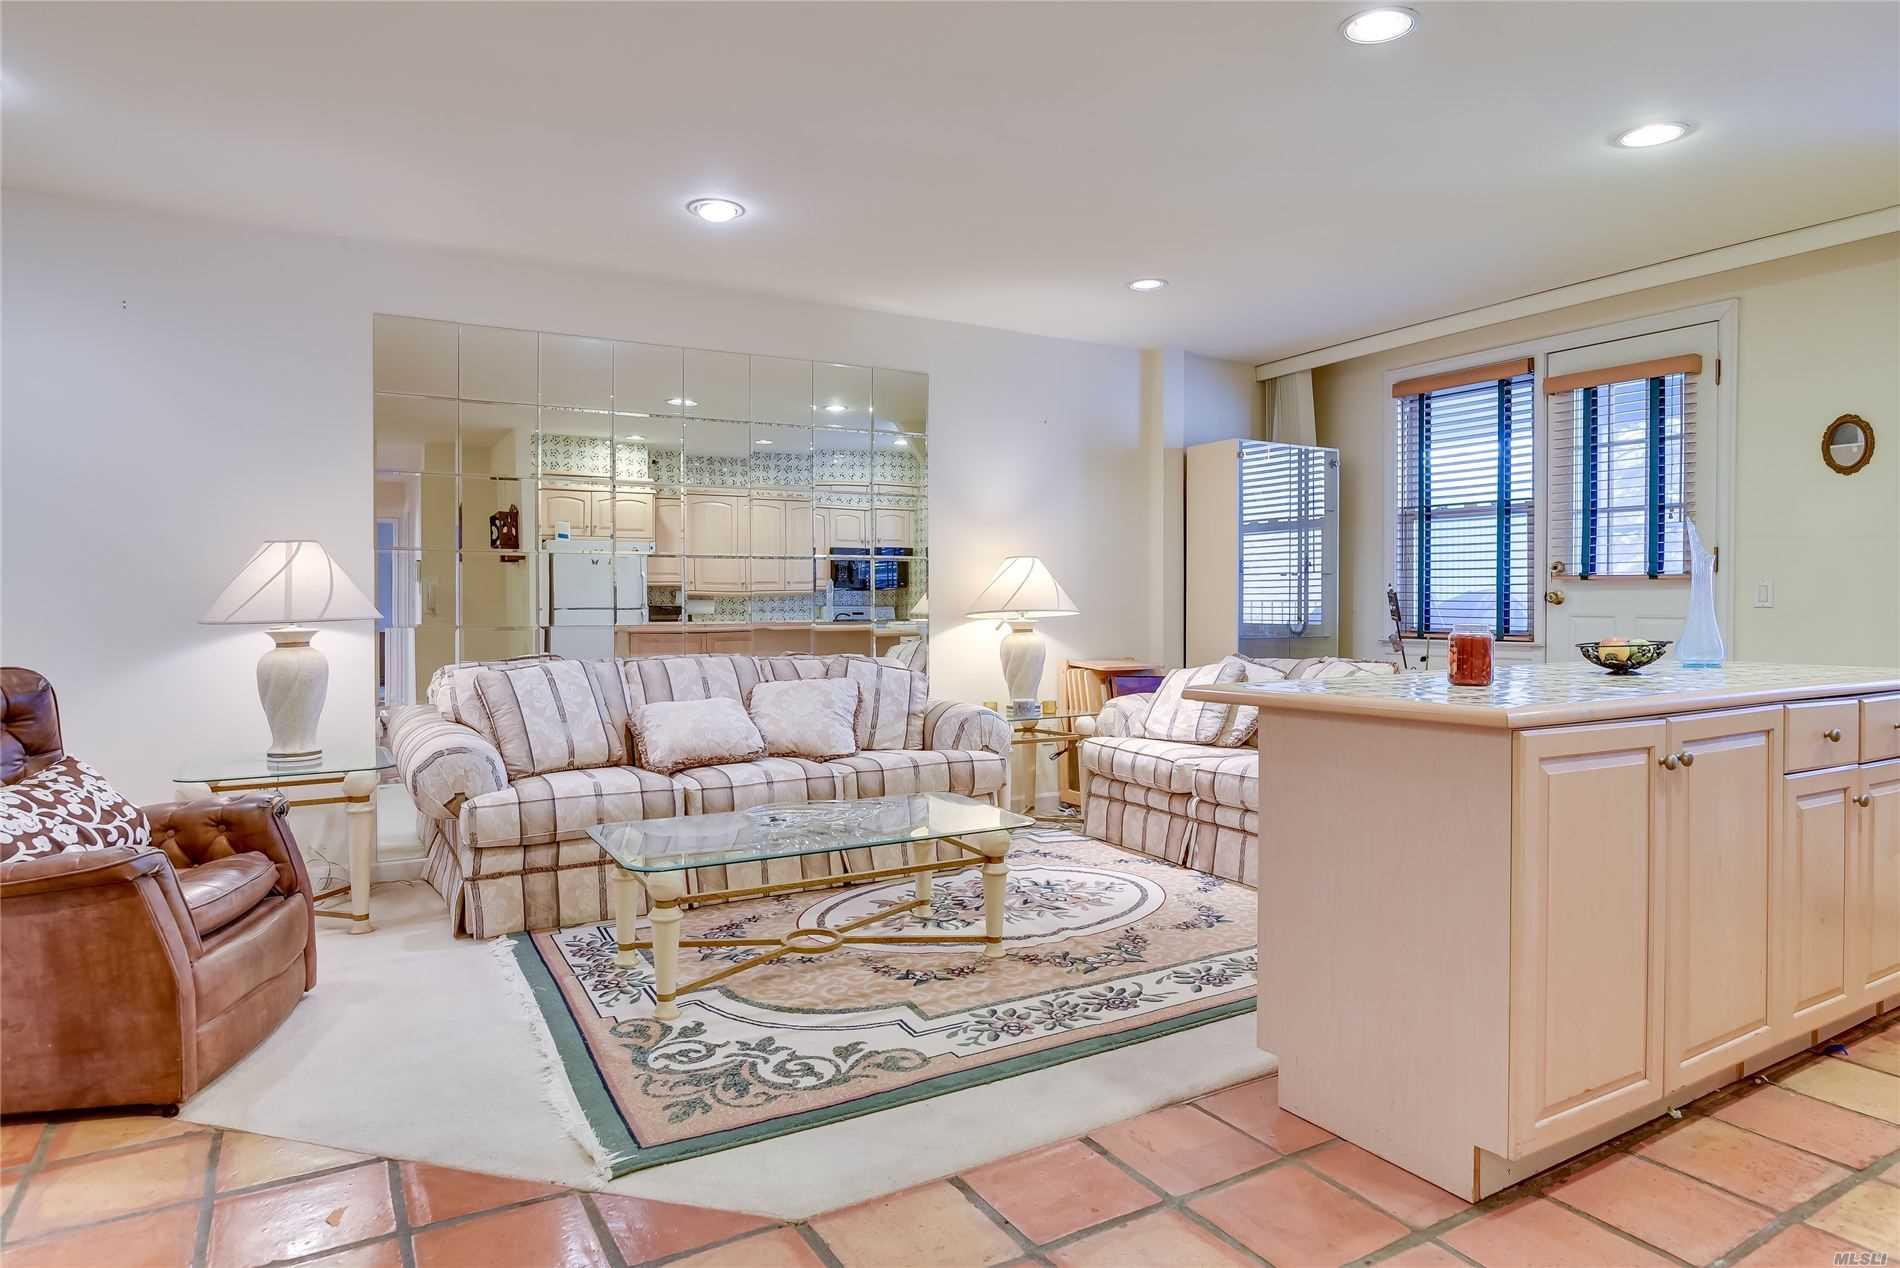 Property for sale at 570 Broadway # 32A, Lynbrook NY 11563, Lynbrook,  New York 11563